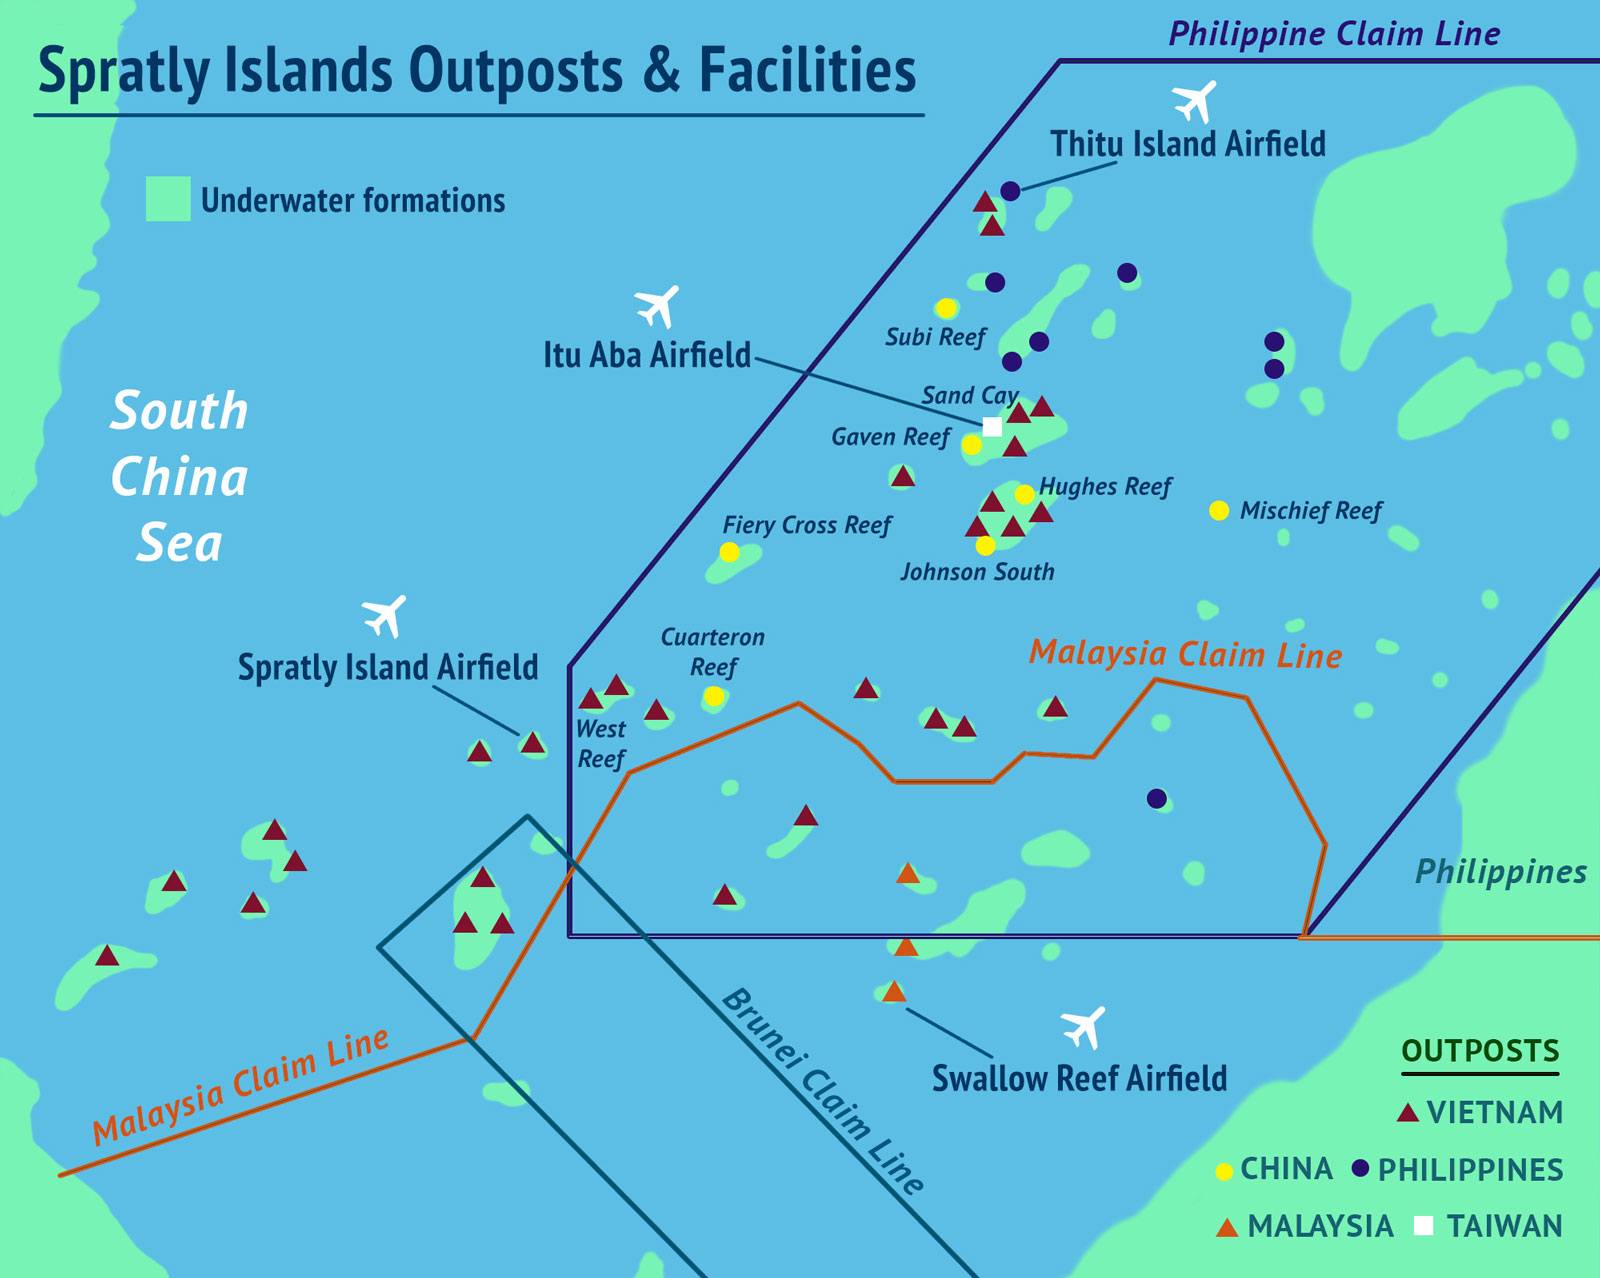 Spratly Island Outposts